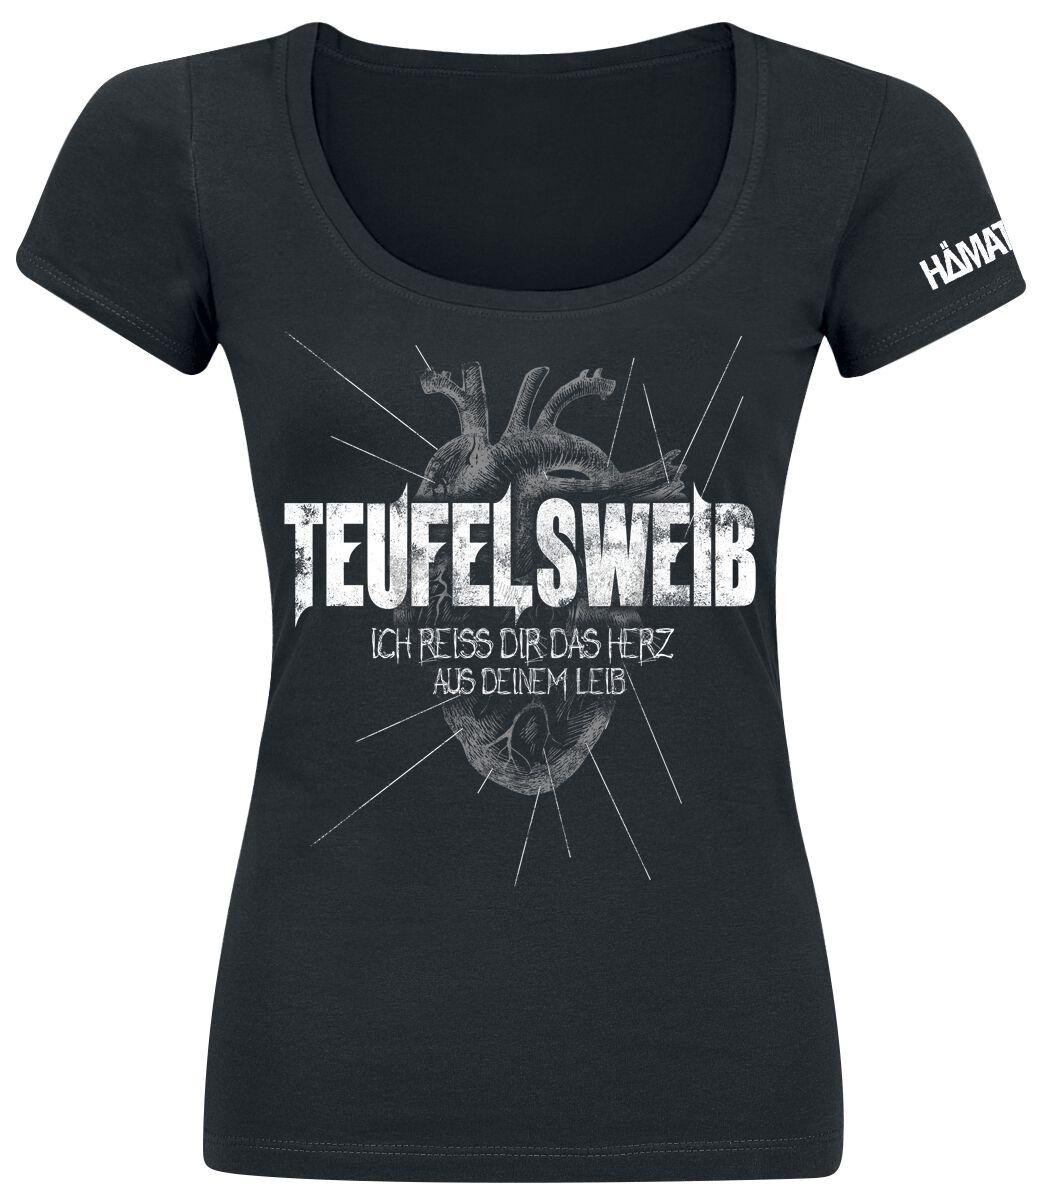 Zespoły - Koszulki - Koszulka damska Hämatom Teufelsweib Koszulka damska czarny - 295873